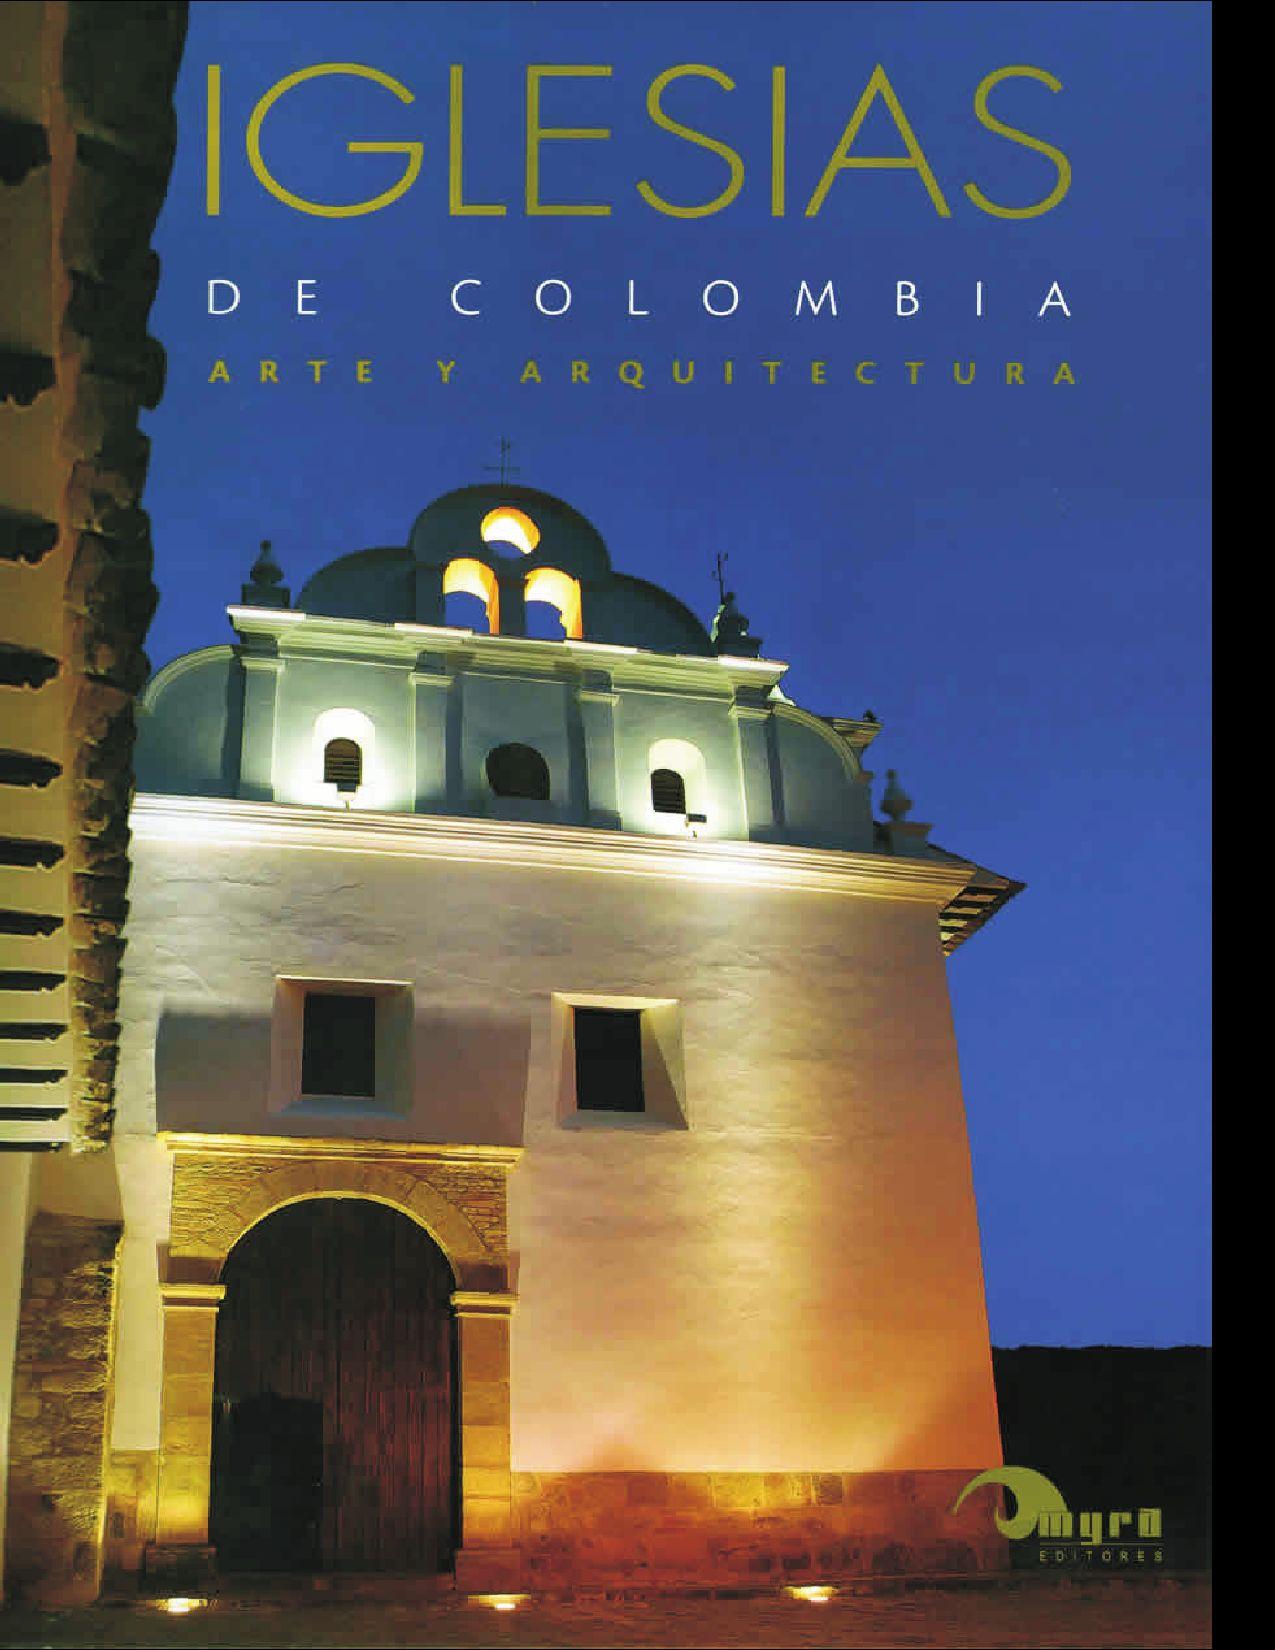 Iglesias de colombia capilla gimnasio moderno by for Gimnasio moderno